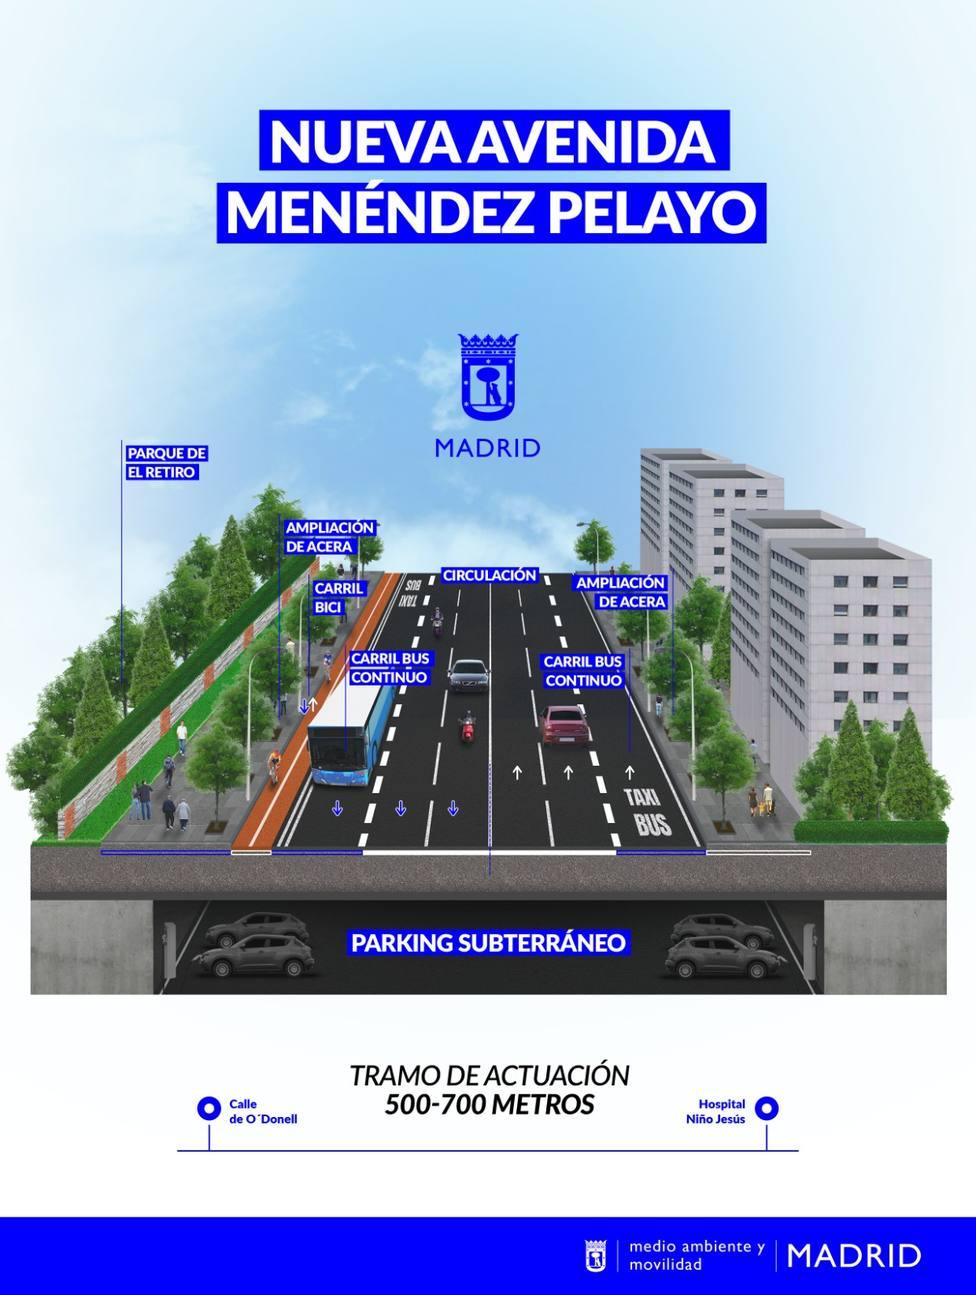 Reforma Menéndez Pelayo